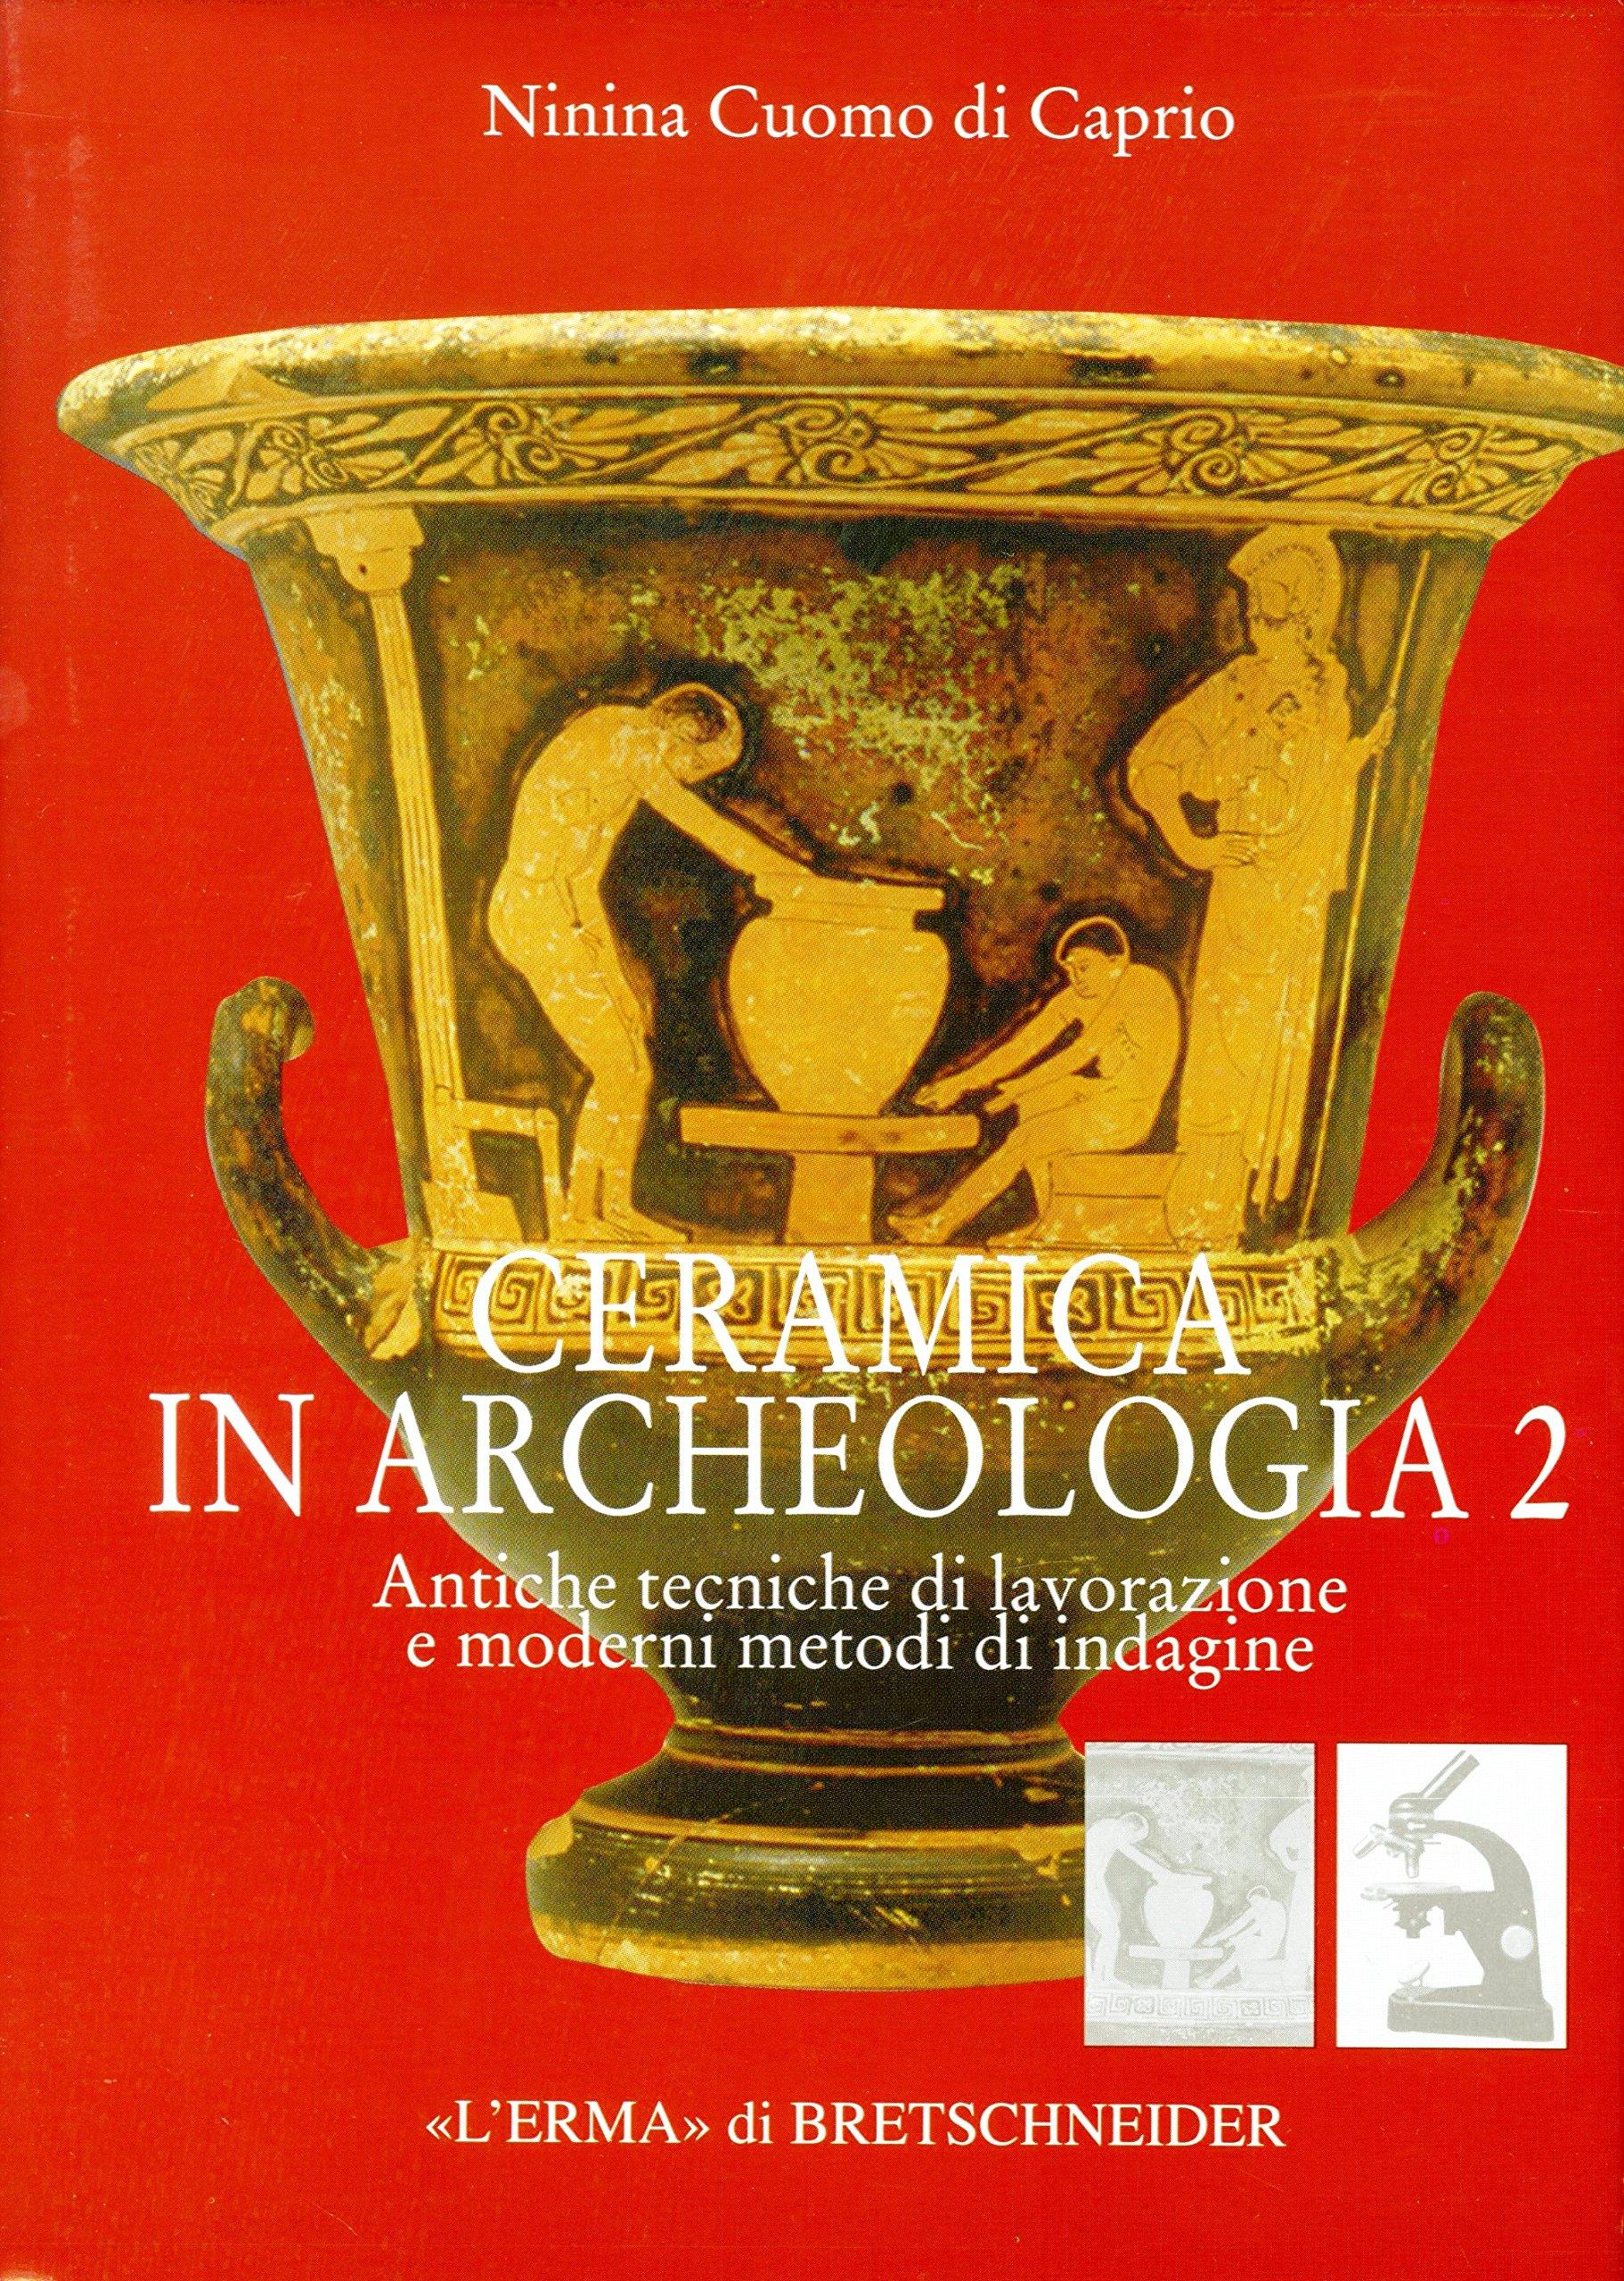 Ceramica in archeologia: 2 Copertina rigida – 30 apr 2007 Ninina Cuomo di Caprio L' Erma di Bretschneider 8882653978 SCIENCE / History